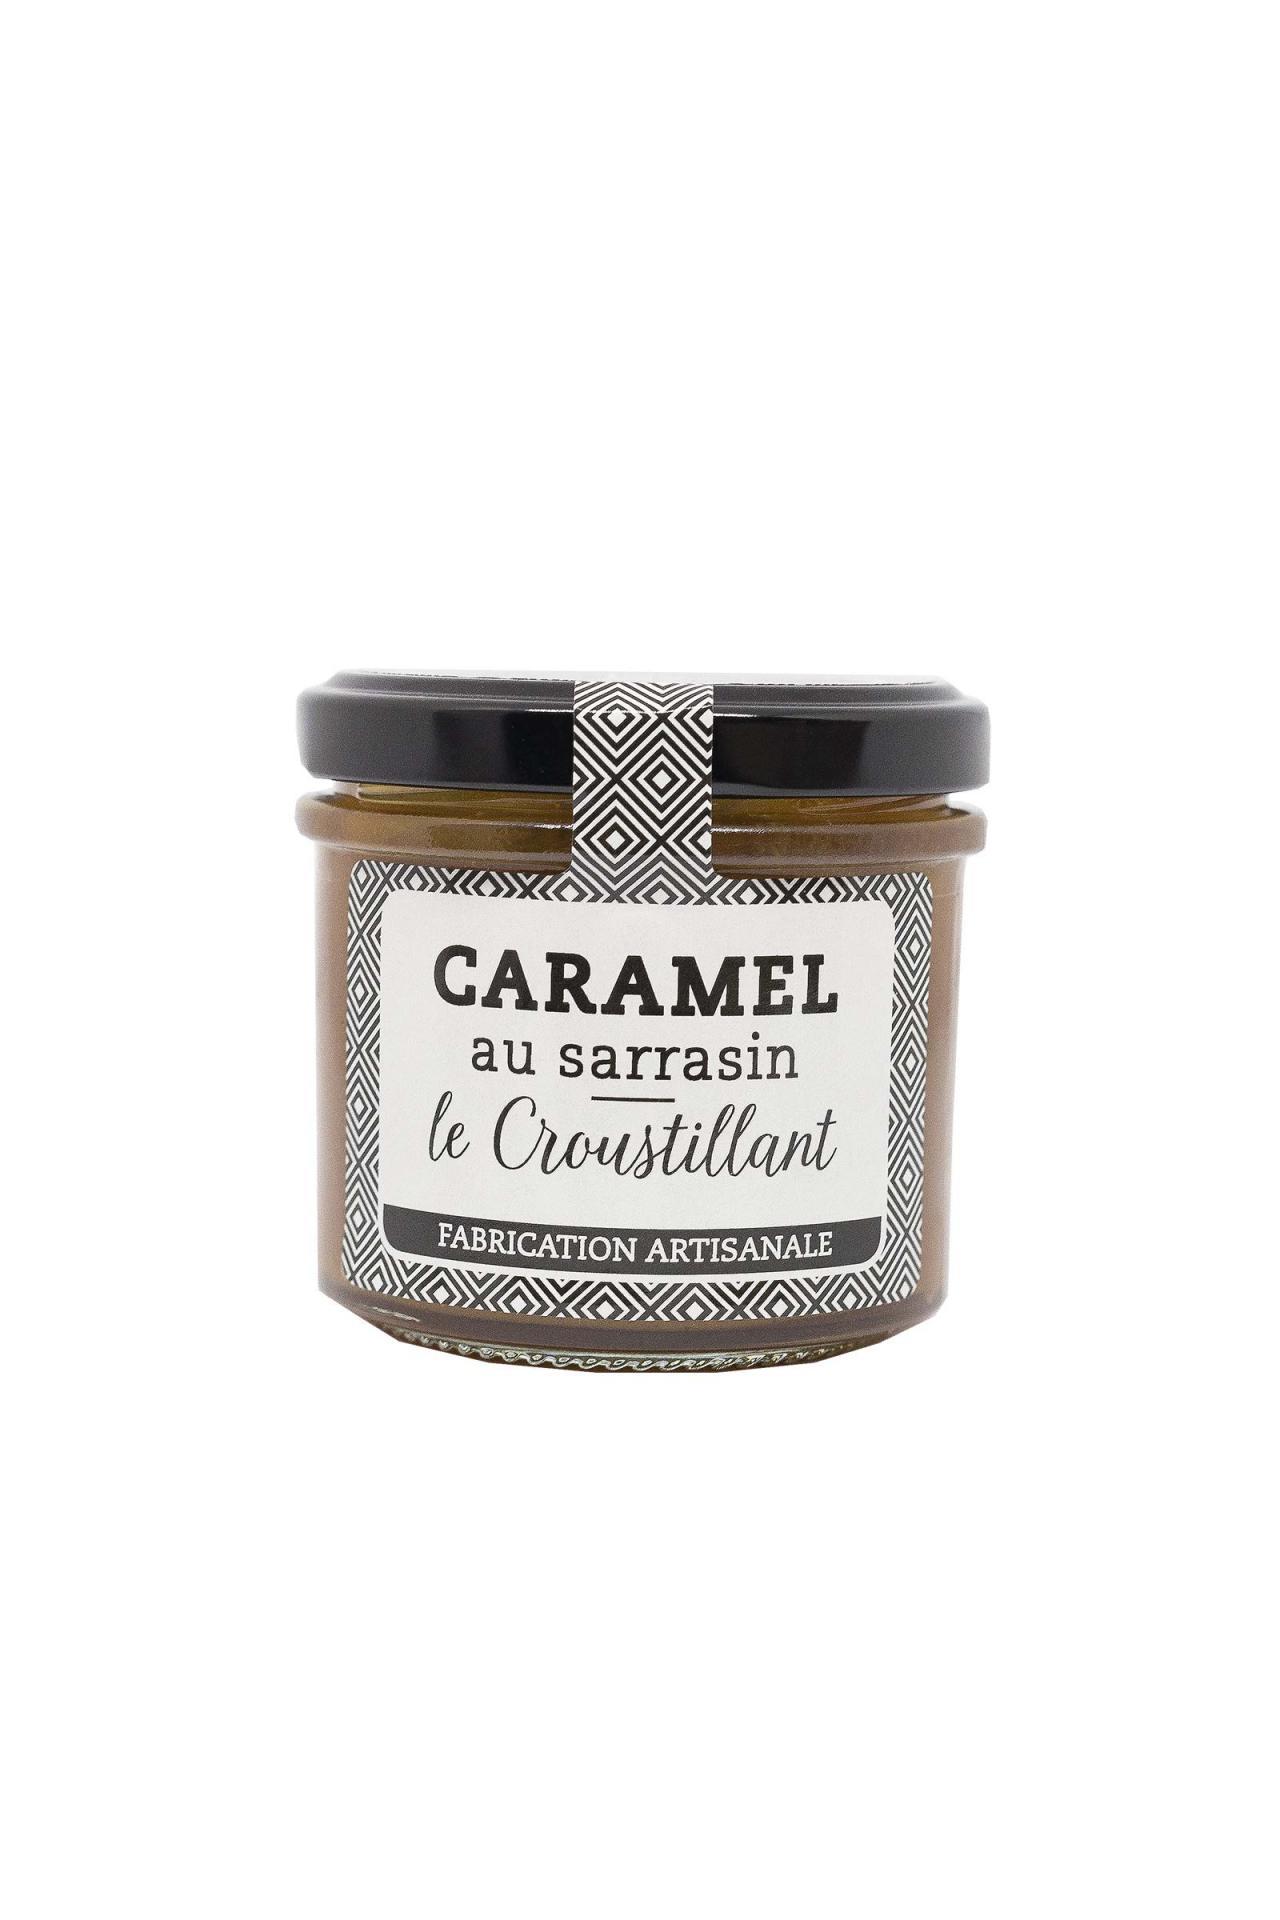 Caramel de sarassin